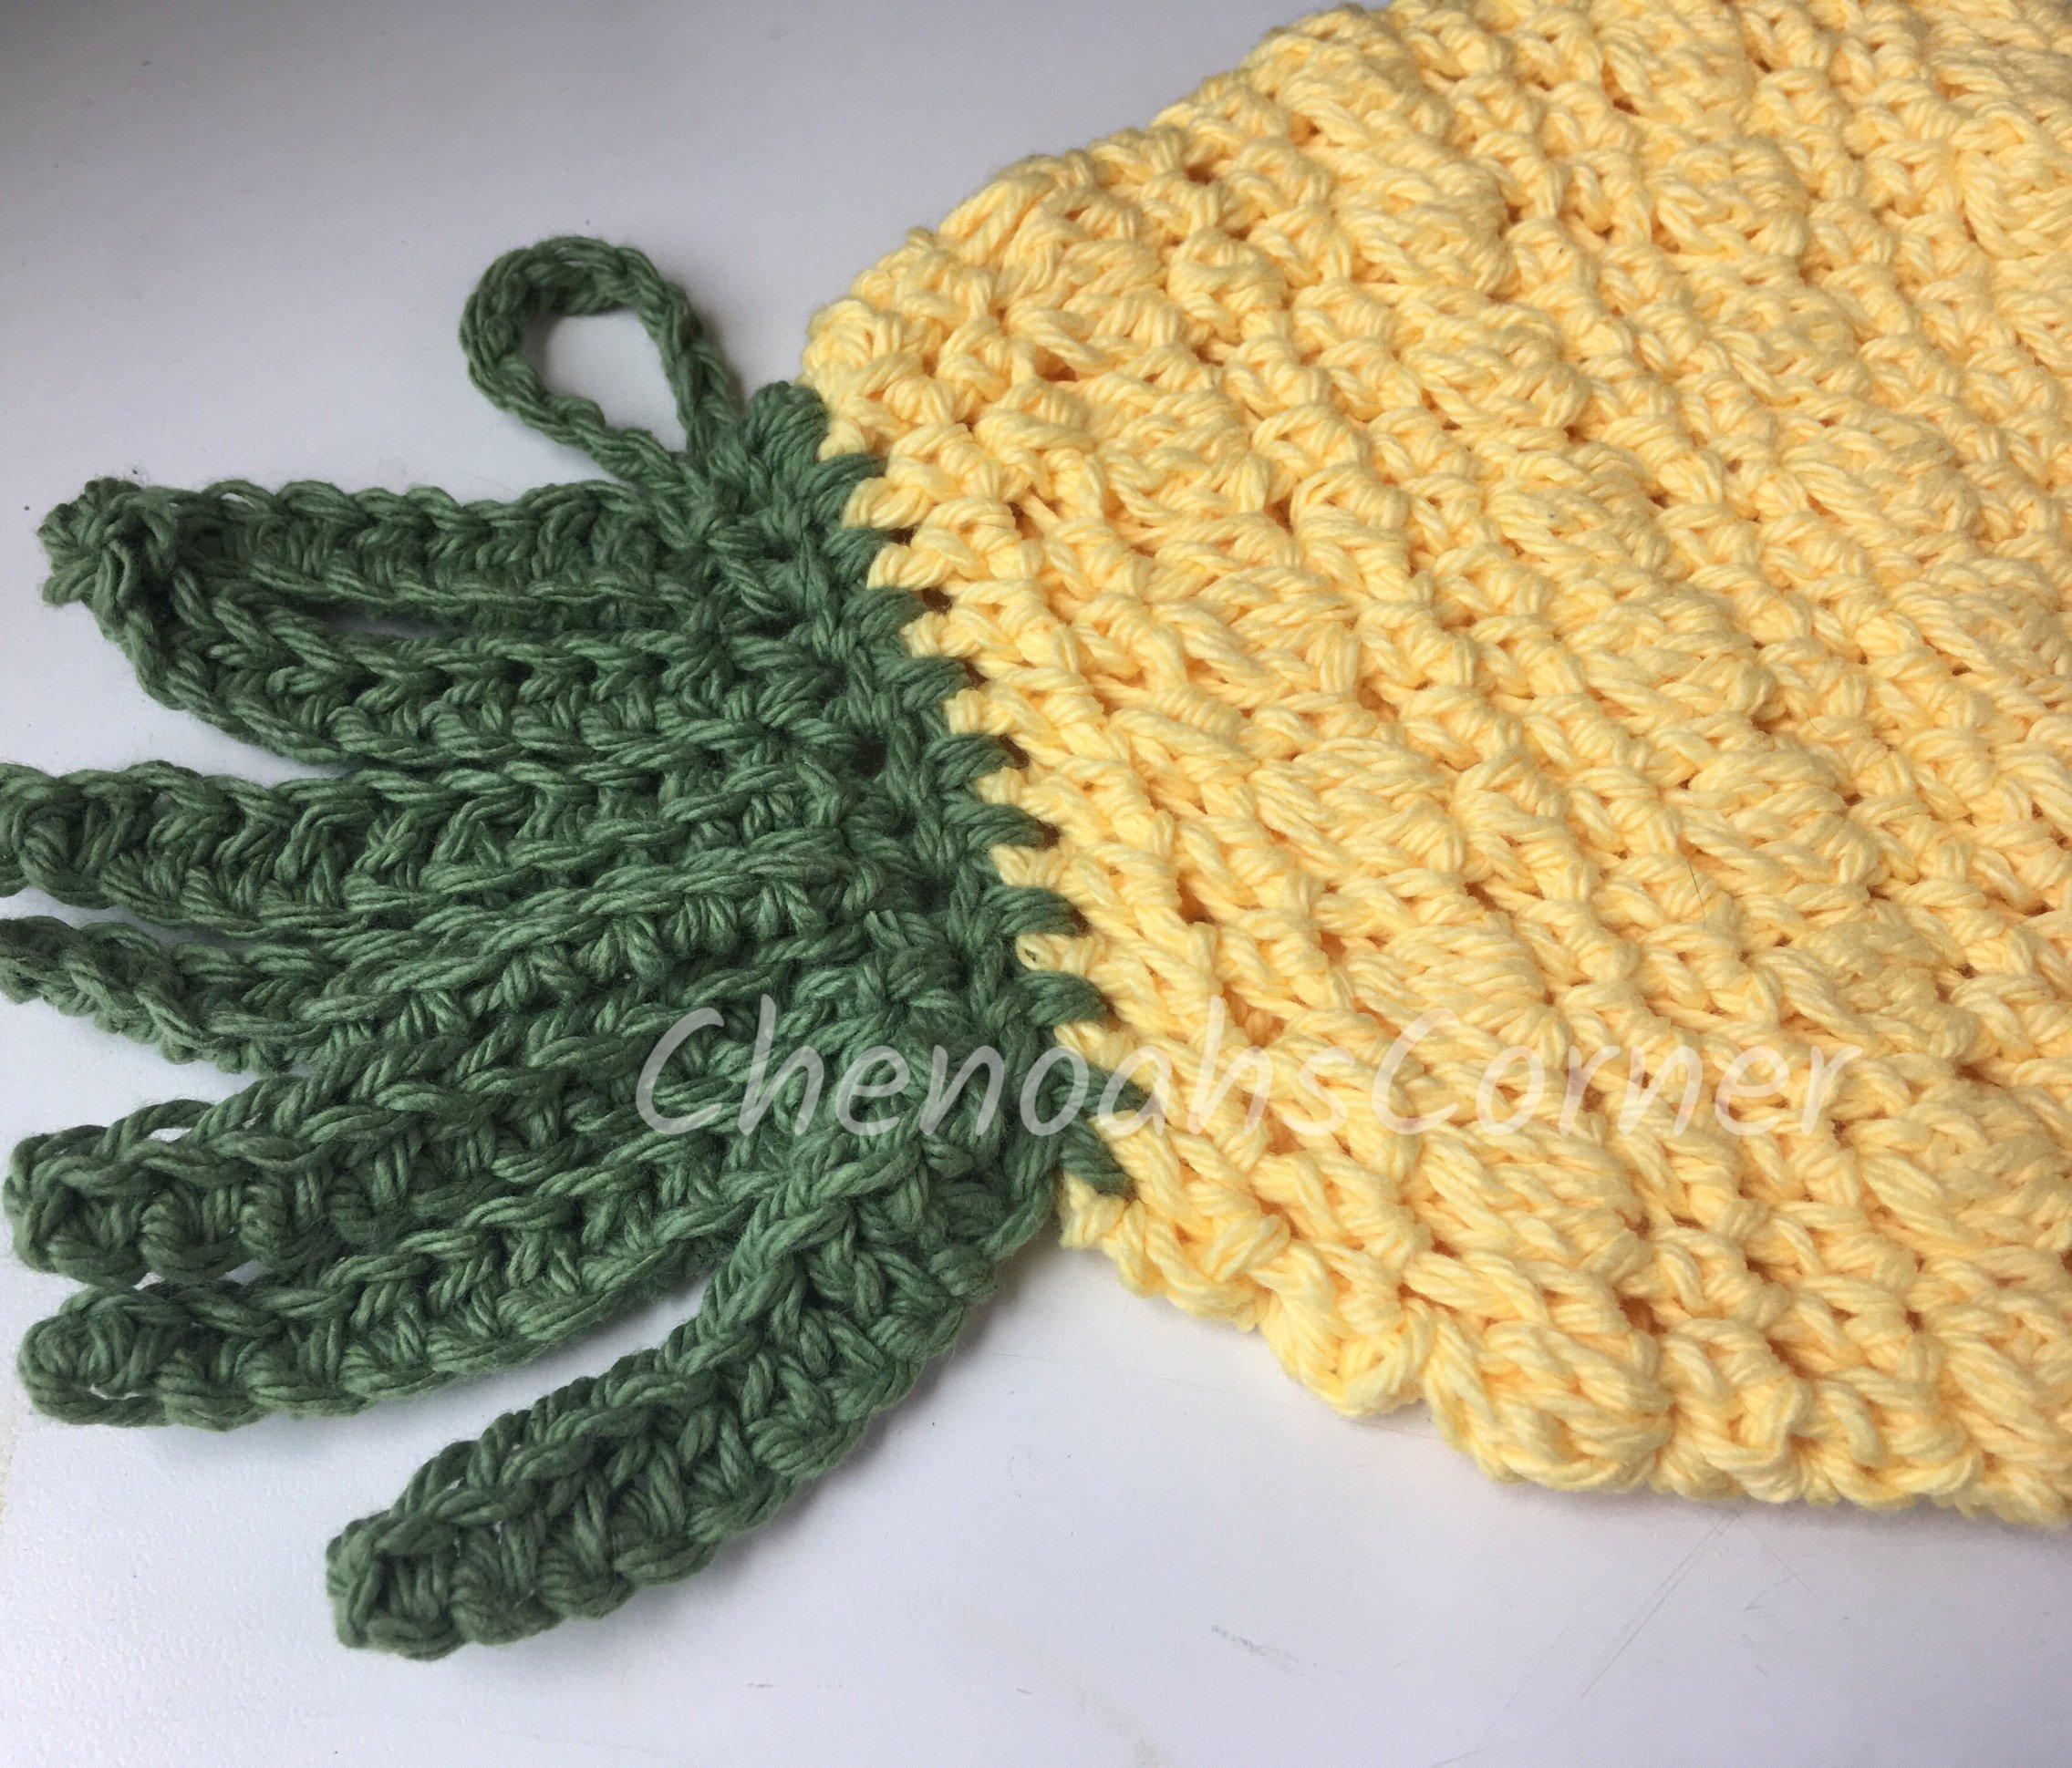 Crochet Trivets Hot Pads Pineapple Trivet Crochet Trivet Pineapple Hot Pad Crochet Etsy